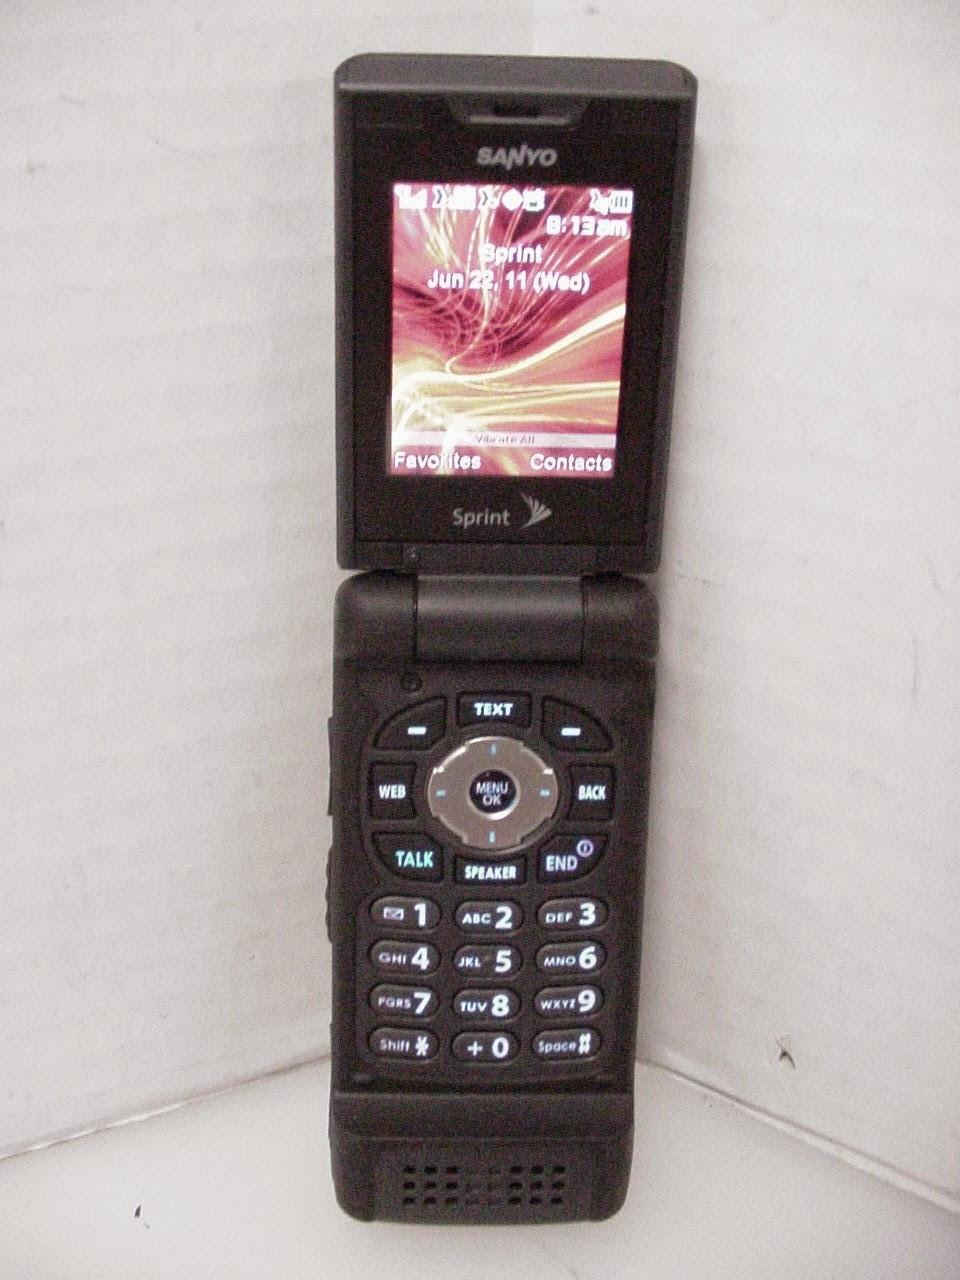 military standard phone cell phone rugged sprint sanyo